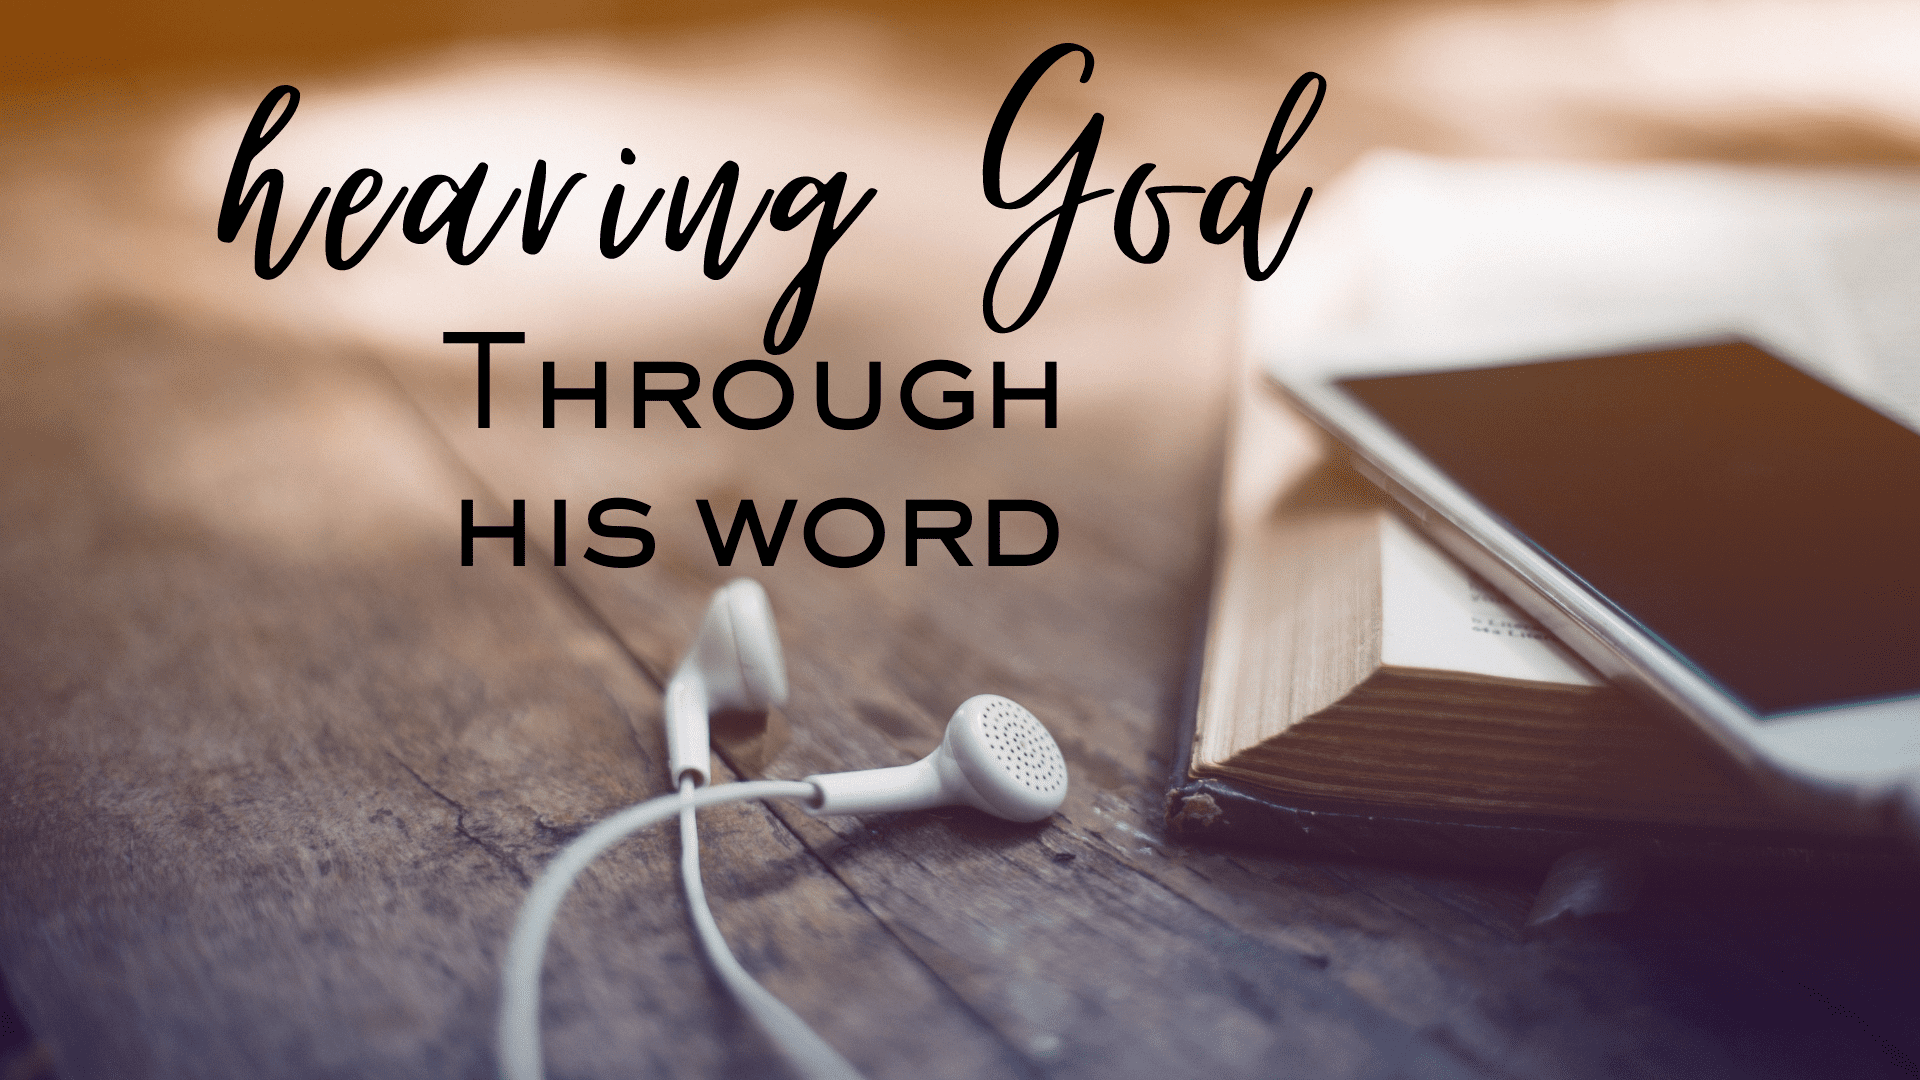 Through His Word